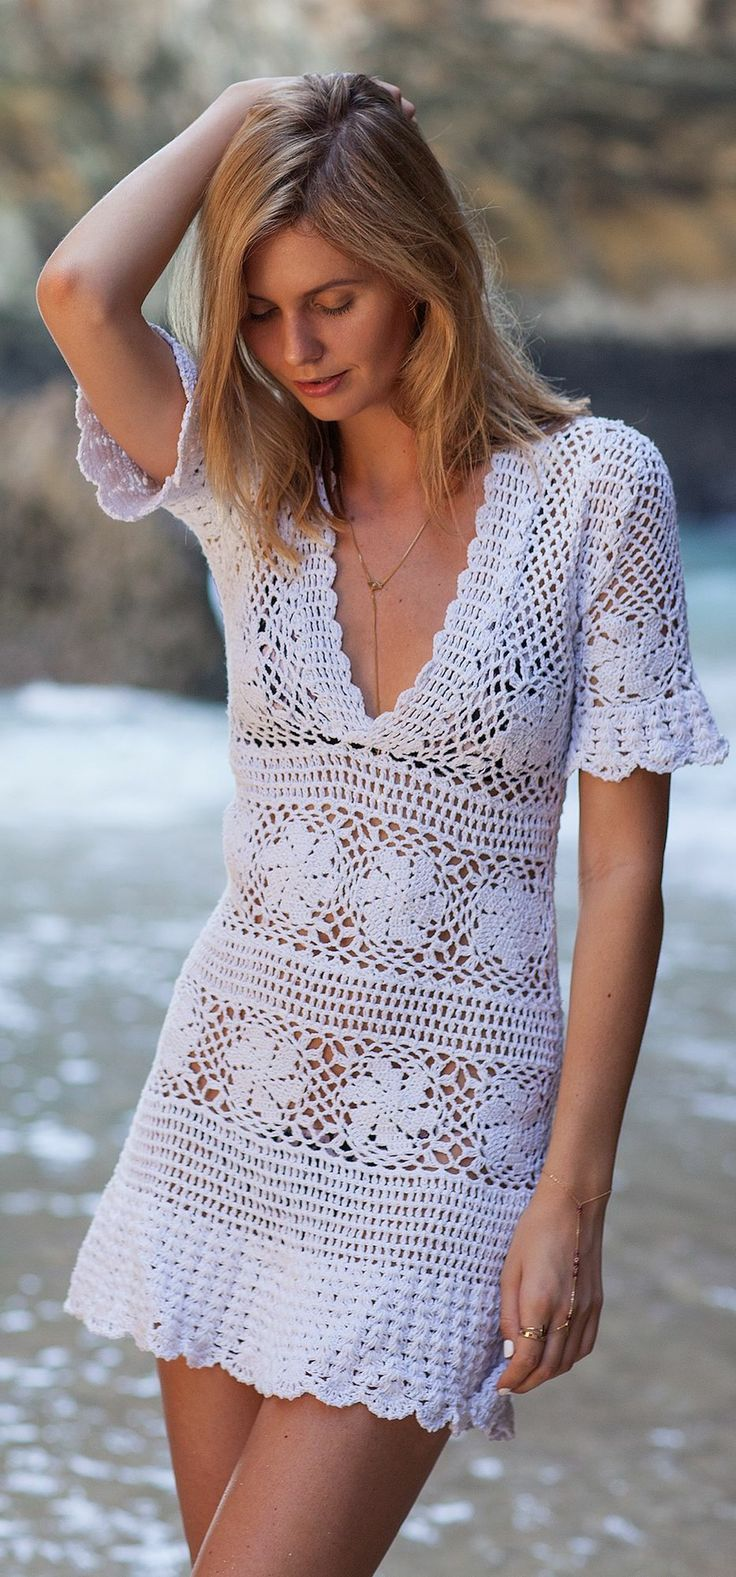 Jackolivia's Fashion Blog: White Stripe Crochet V-neck Little Dress                                                                                                                                                      Más